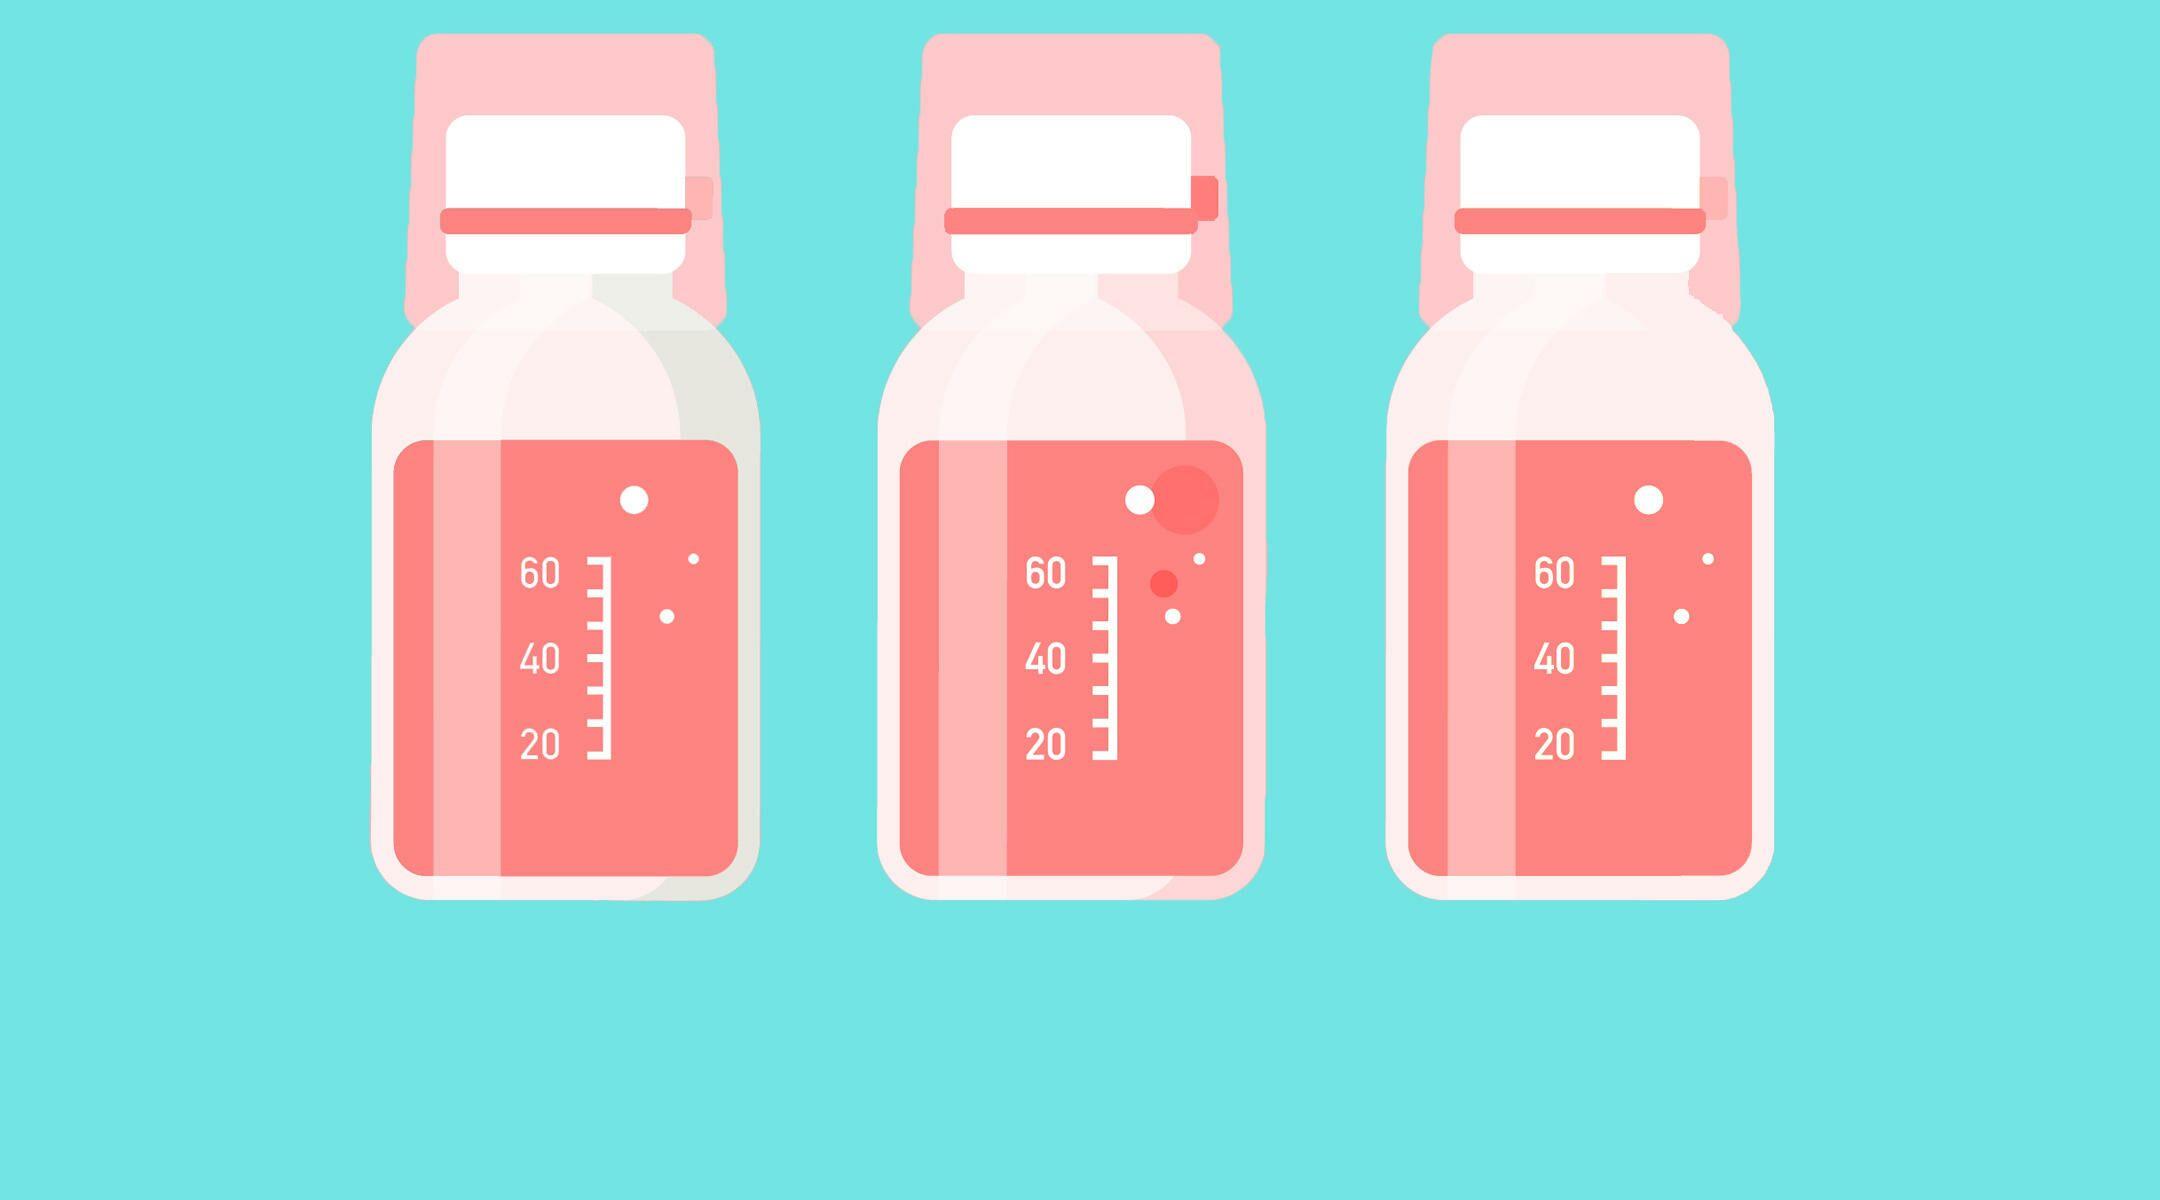 Infant tylenol acetaminophen dosage chart nvjuhfo Images